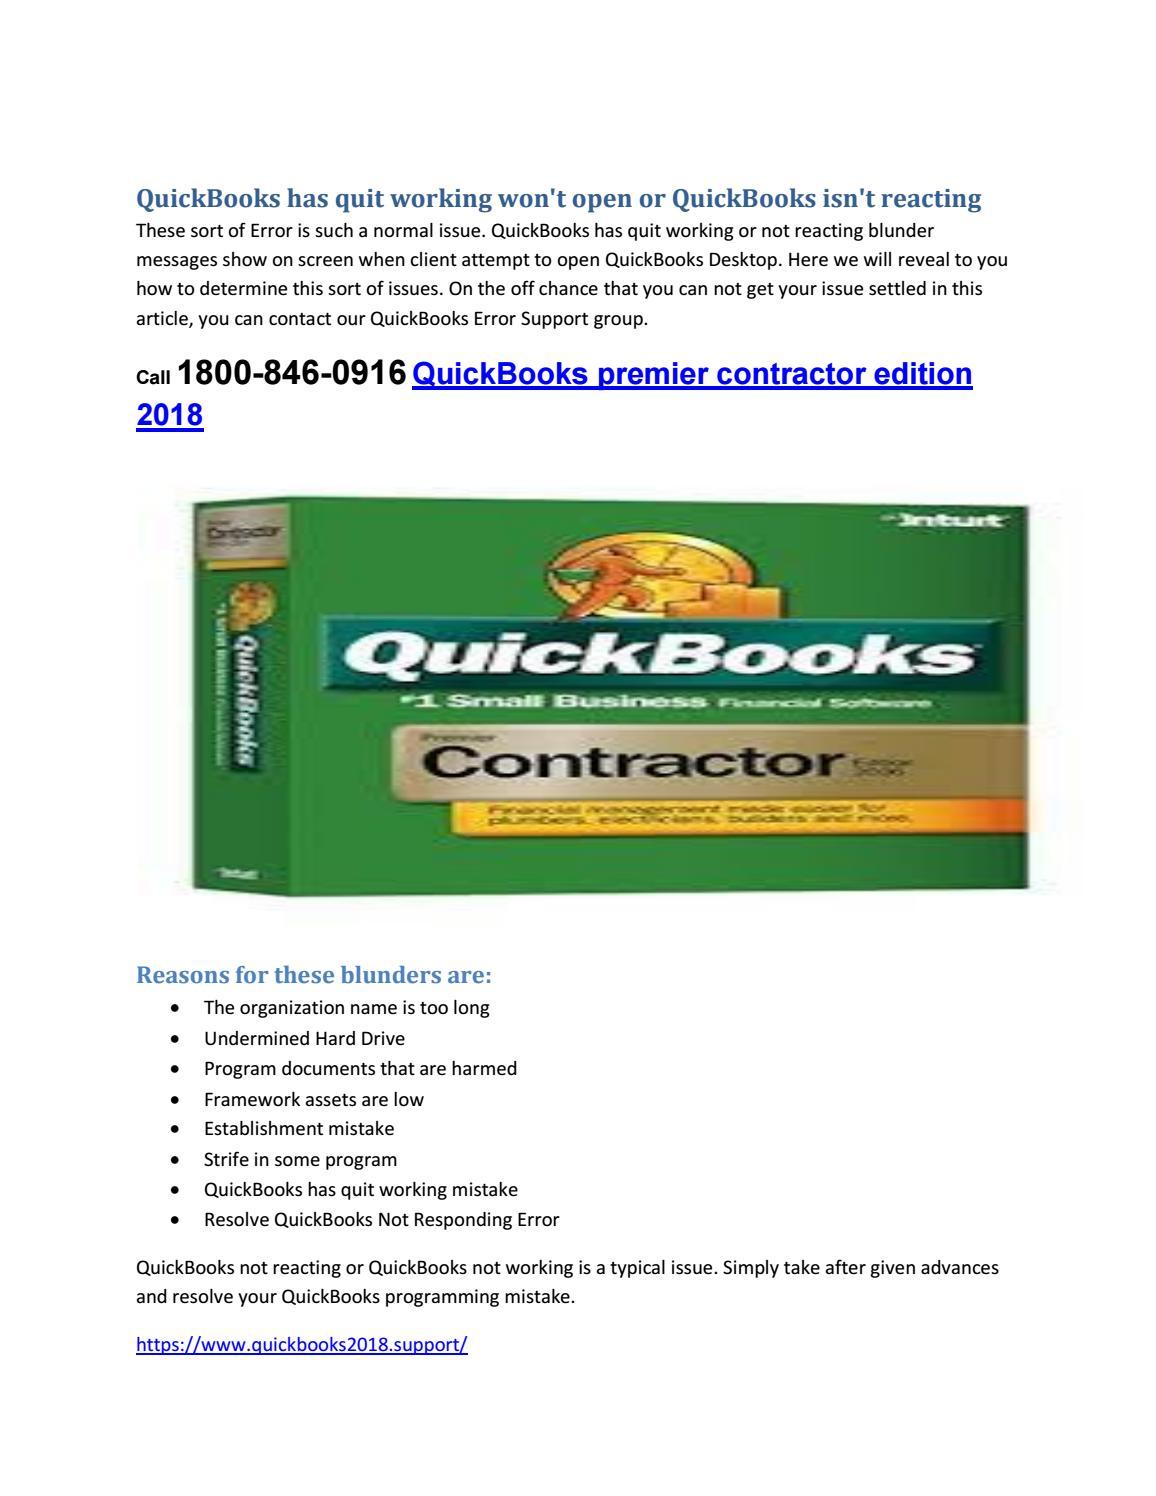 Call 1800 846 0916 quickbooks premier contractor edition